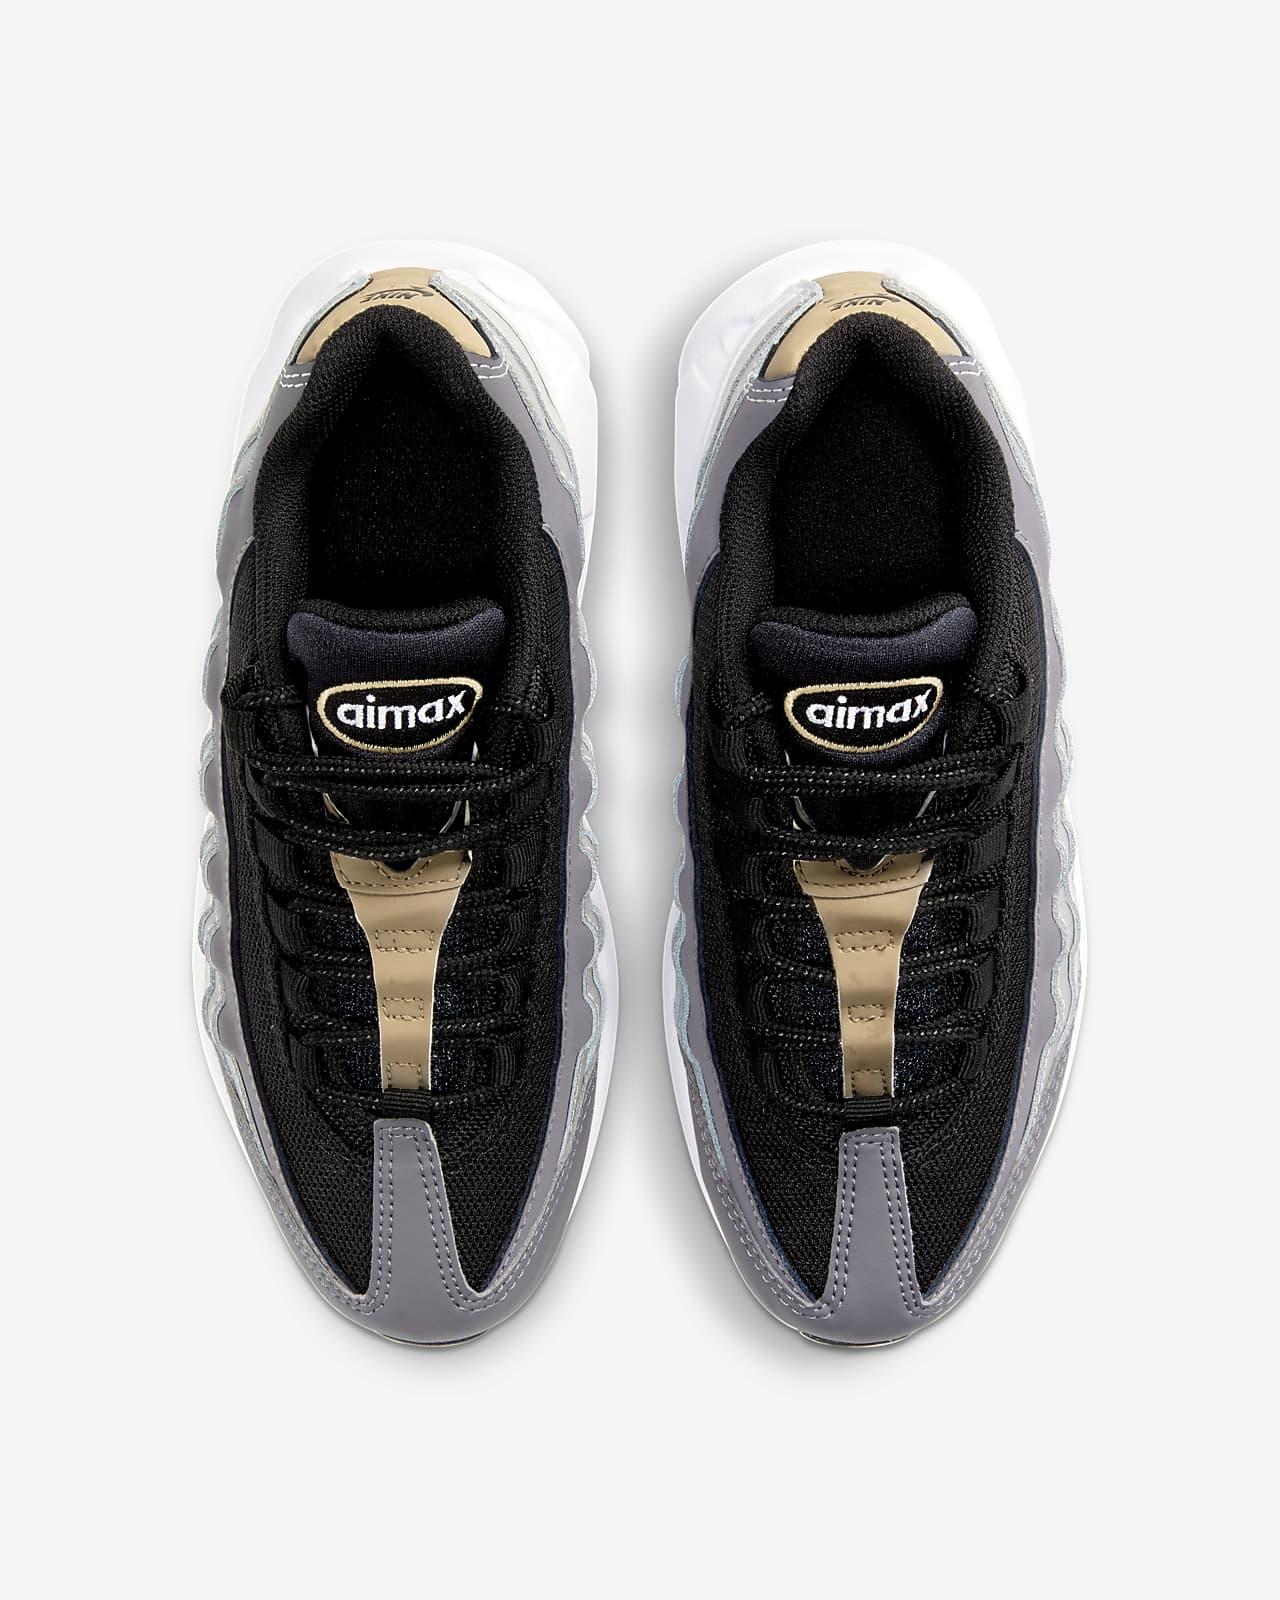 chaussure nike air max 95 recraft pour enfant plus age